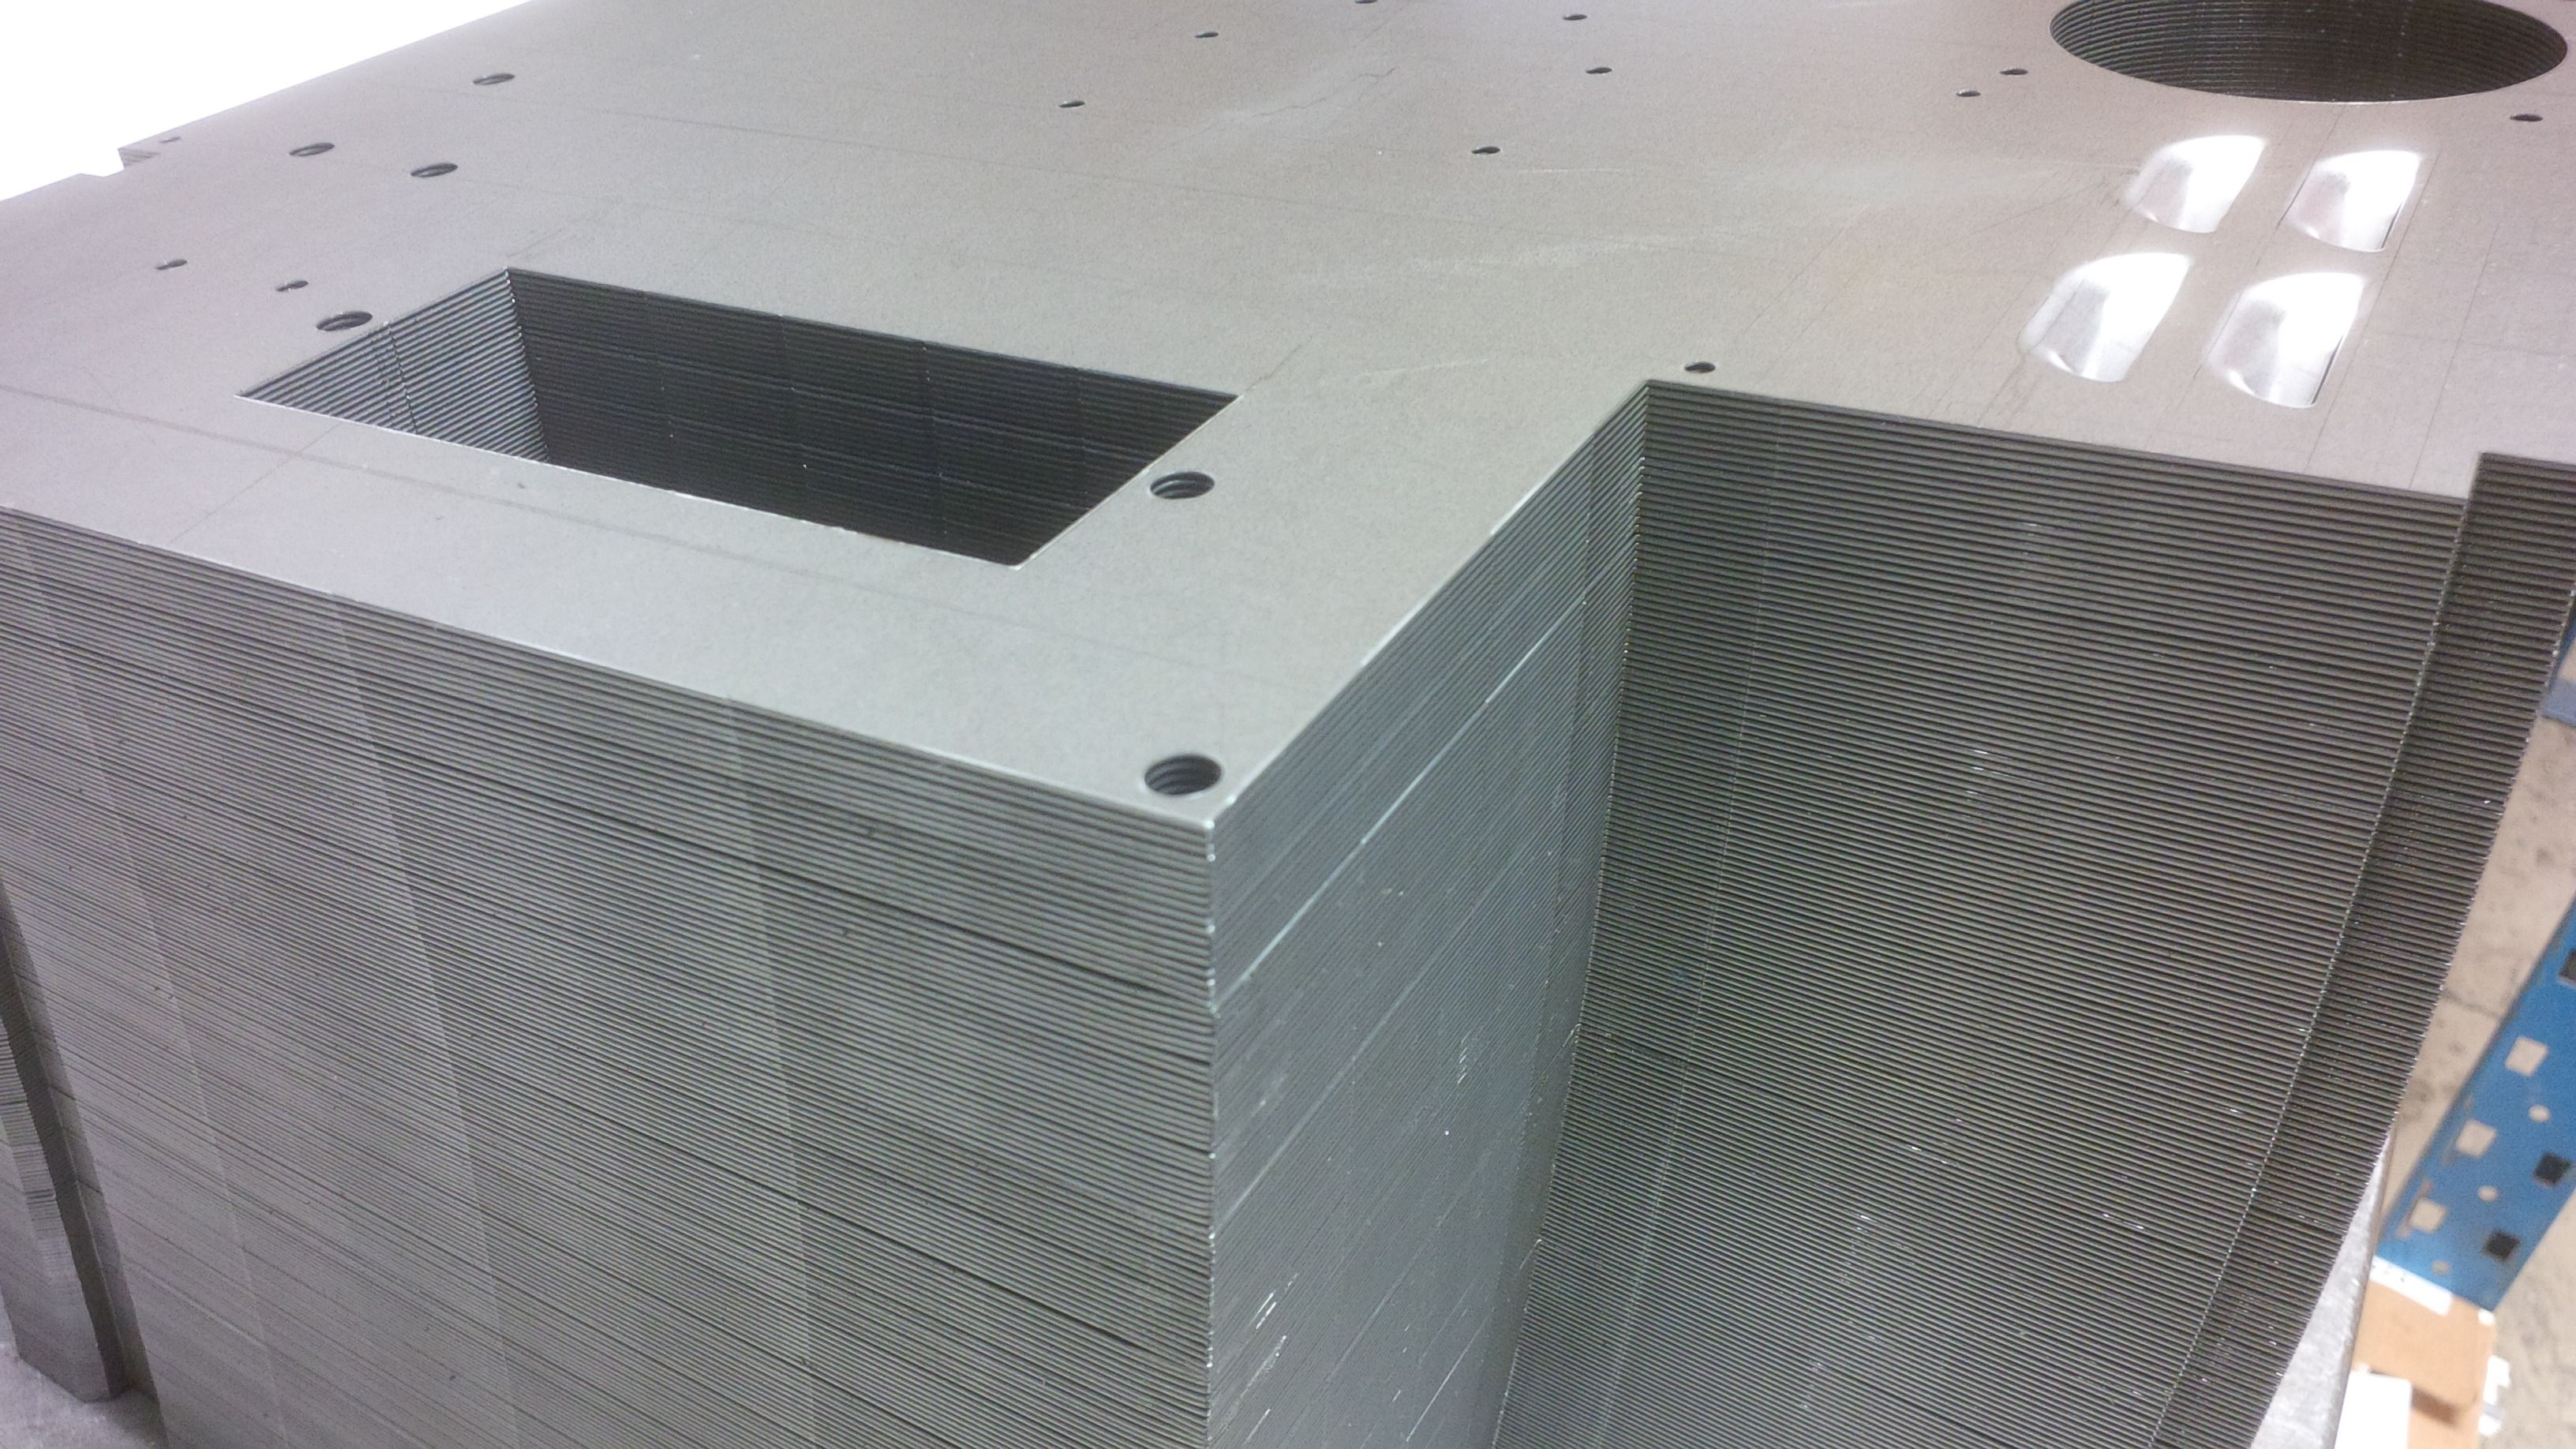 Cnc Punched Mild Steel Enclosures Awaiting Bending Www Vandf Co Uk Sheet Metal Work Types Of Sheet Metal Metal Working